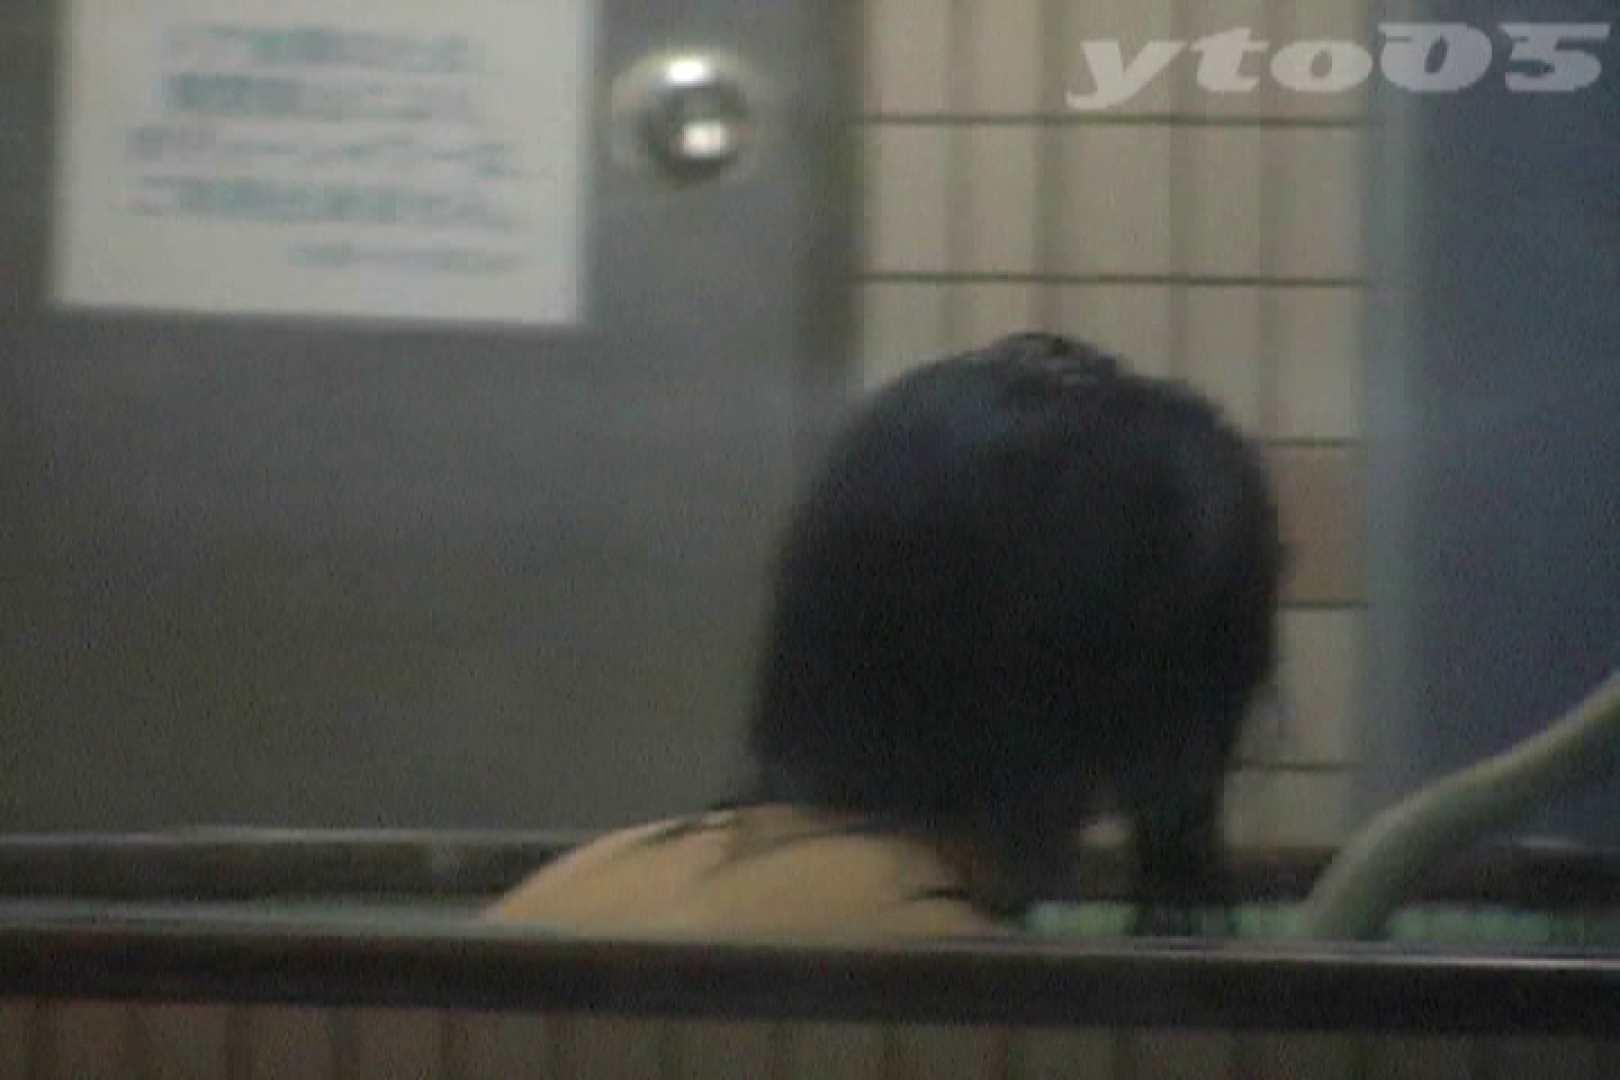 ▲復活限定▲合宿ホテル女風呂盗撮 Vol.31 期間限定 AV無料 85pic 21